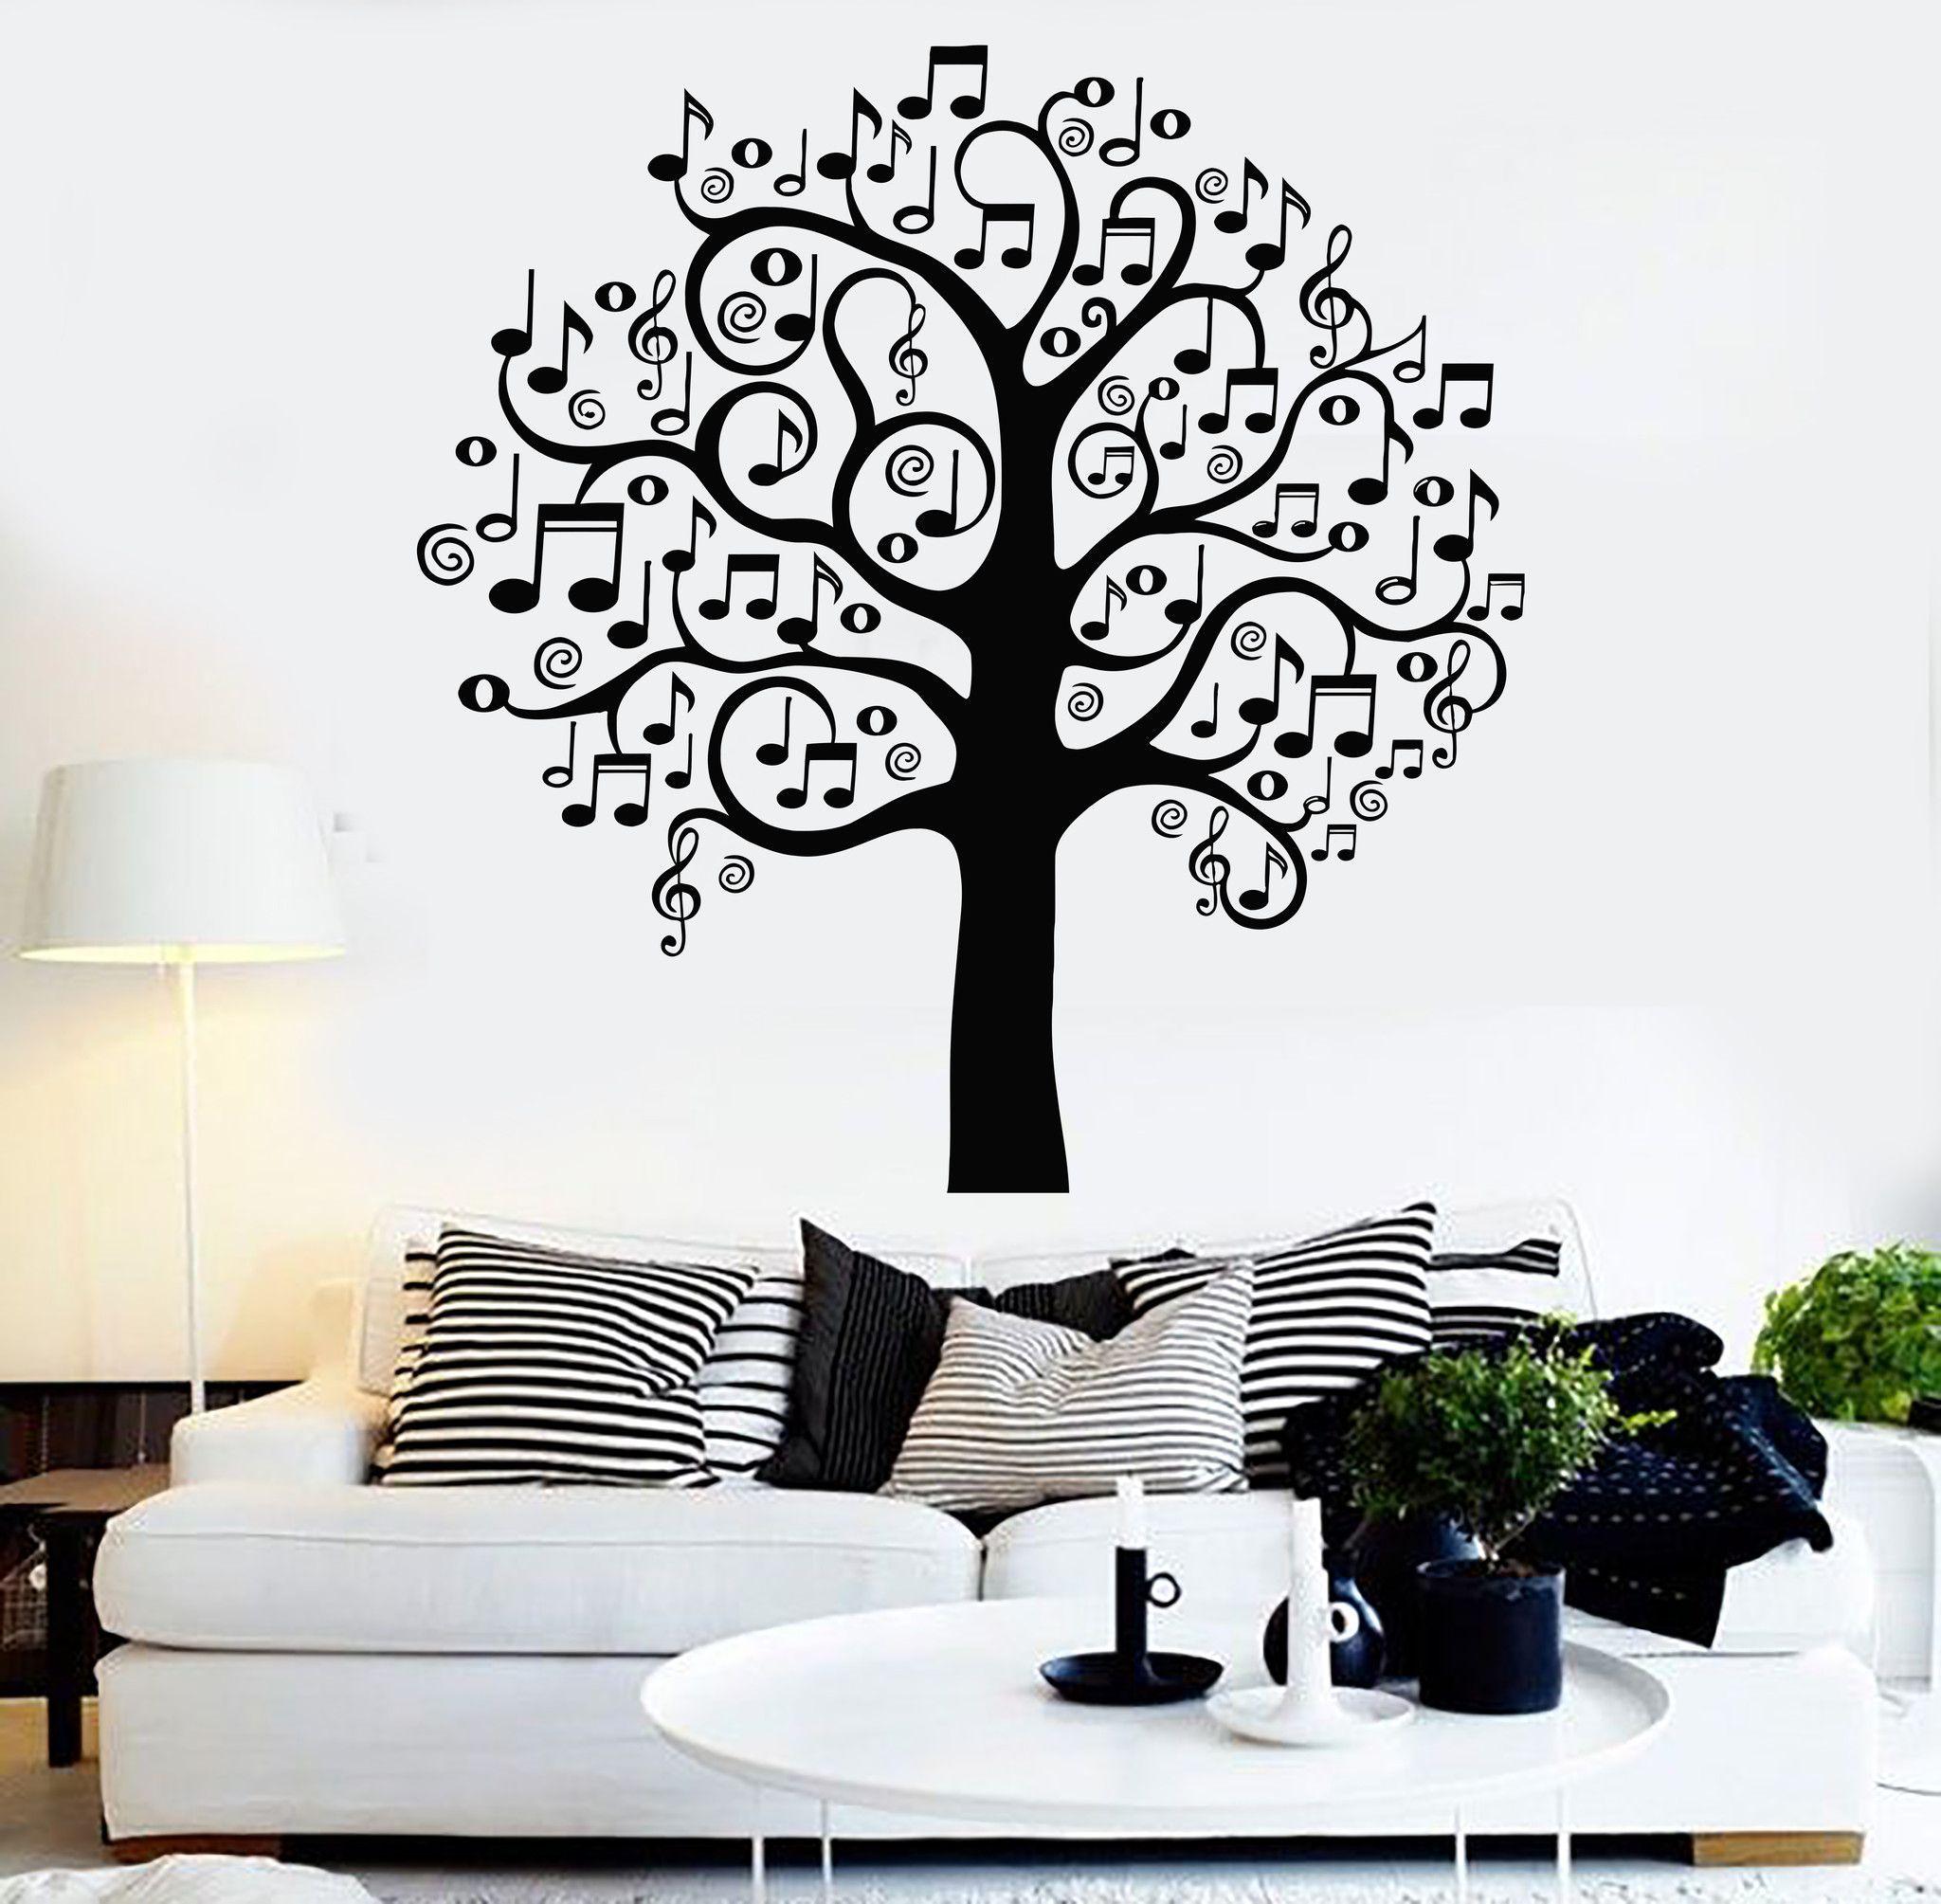 Vinyl Wall Decal Musical Tree Music Art Decor Home Decoration